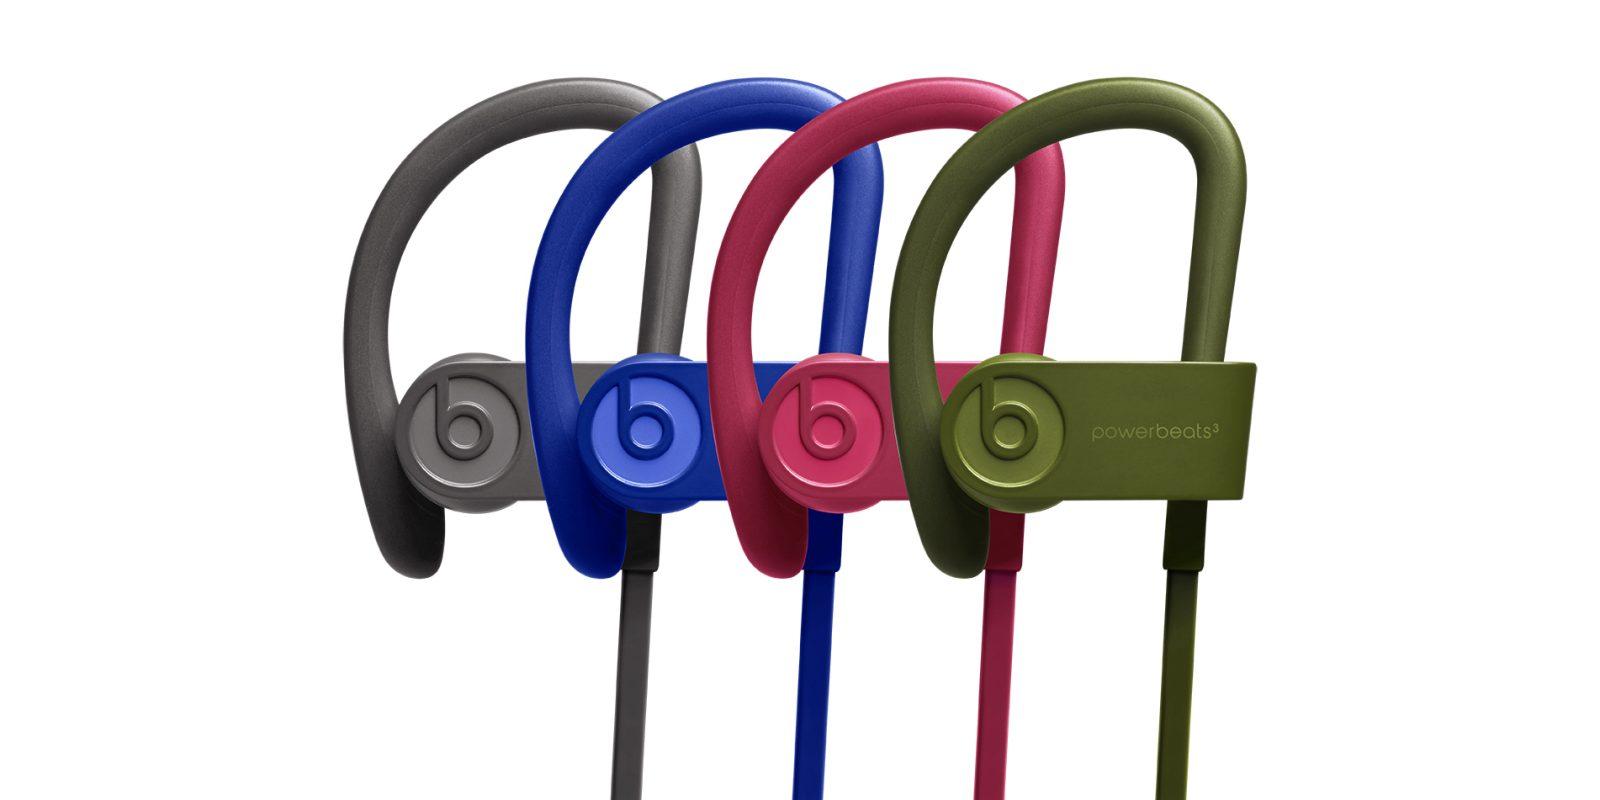 Beats Powerbeats3 Bluetooth Wireless Earphones Brick Red Turf Green Break Blue Asphalt Gray Sold By Proelectronics Distributing Inc Rakuten Com Shop